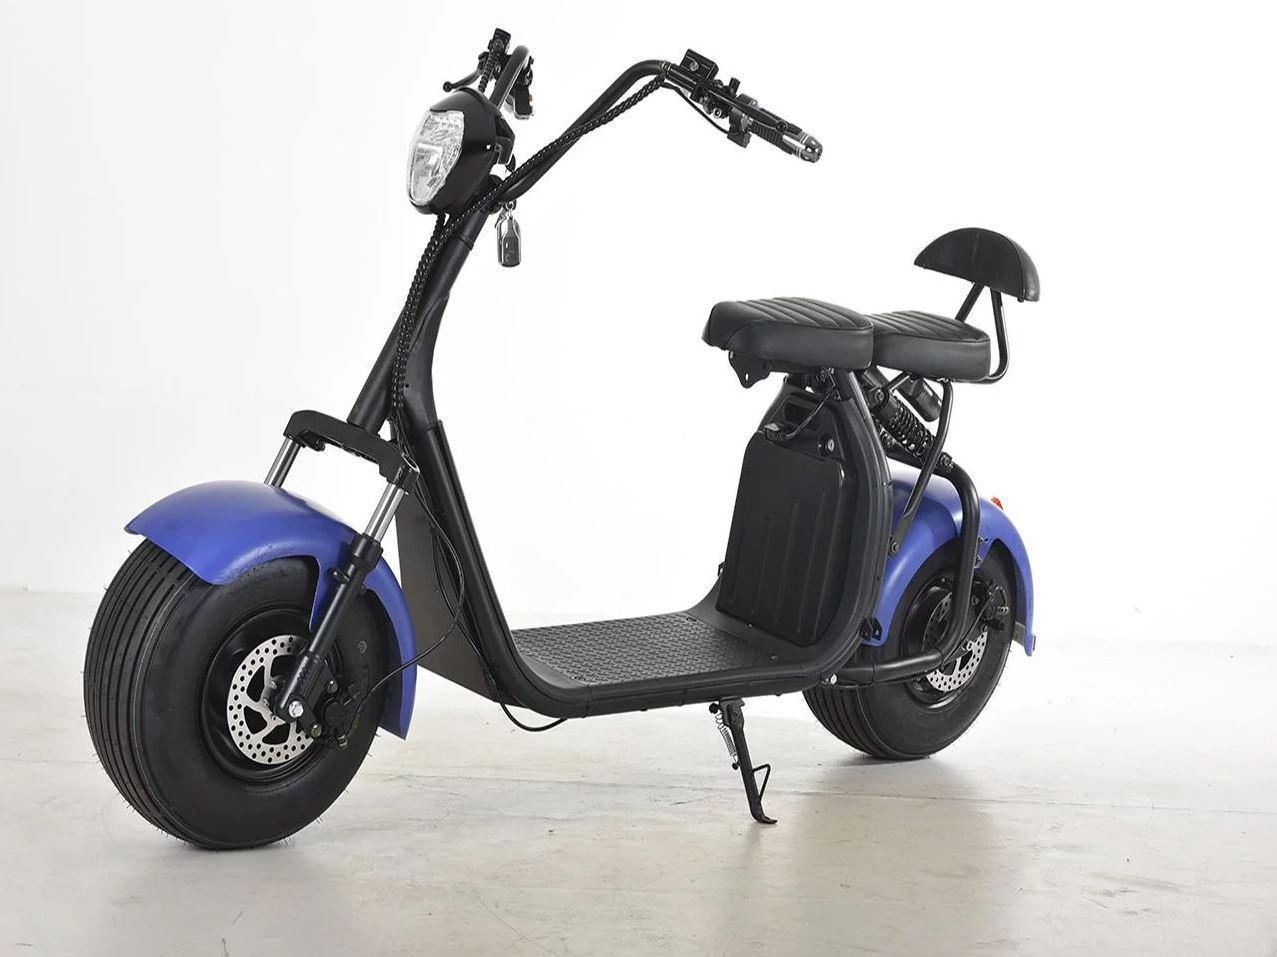 Электроскутер Citycoco Harley Pro 2 (H8PX) 1200W